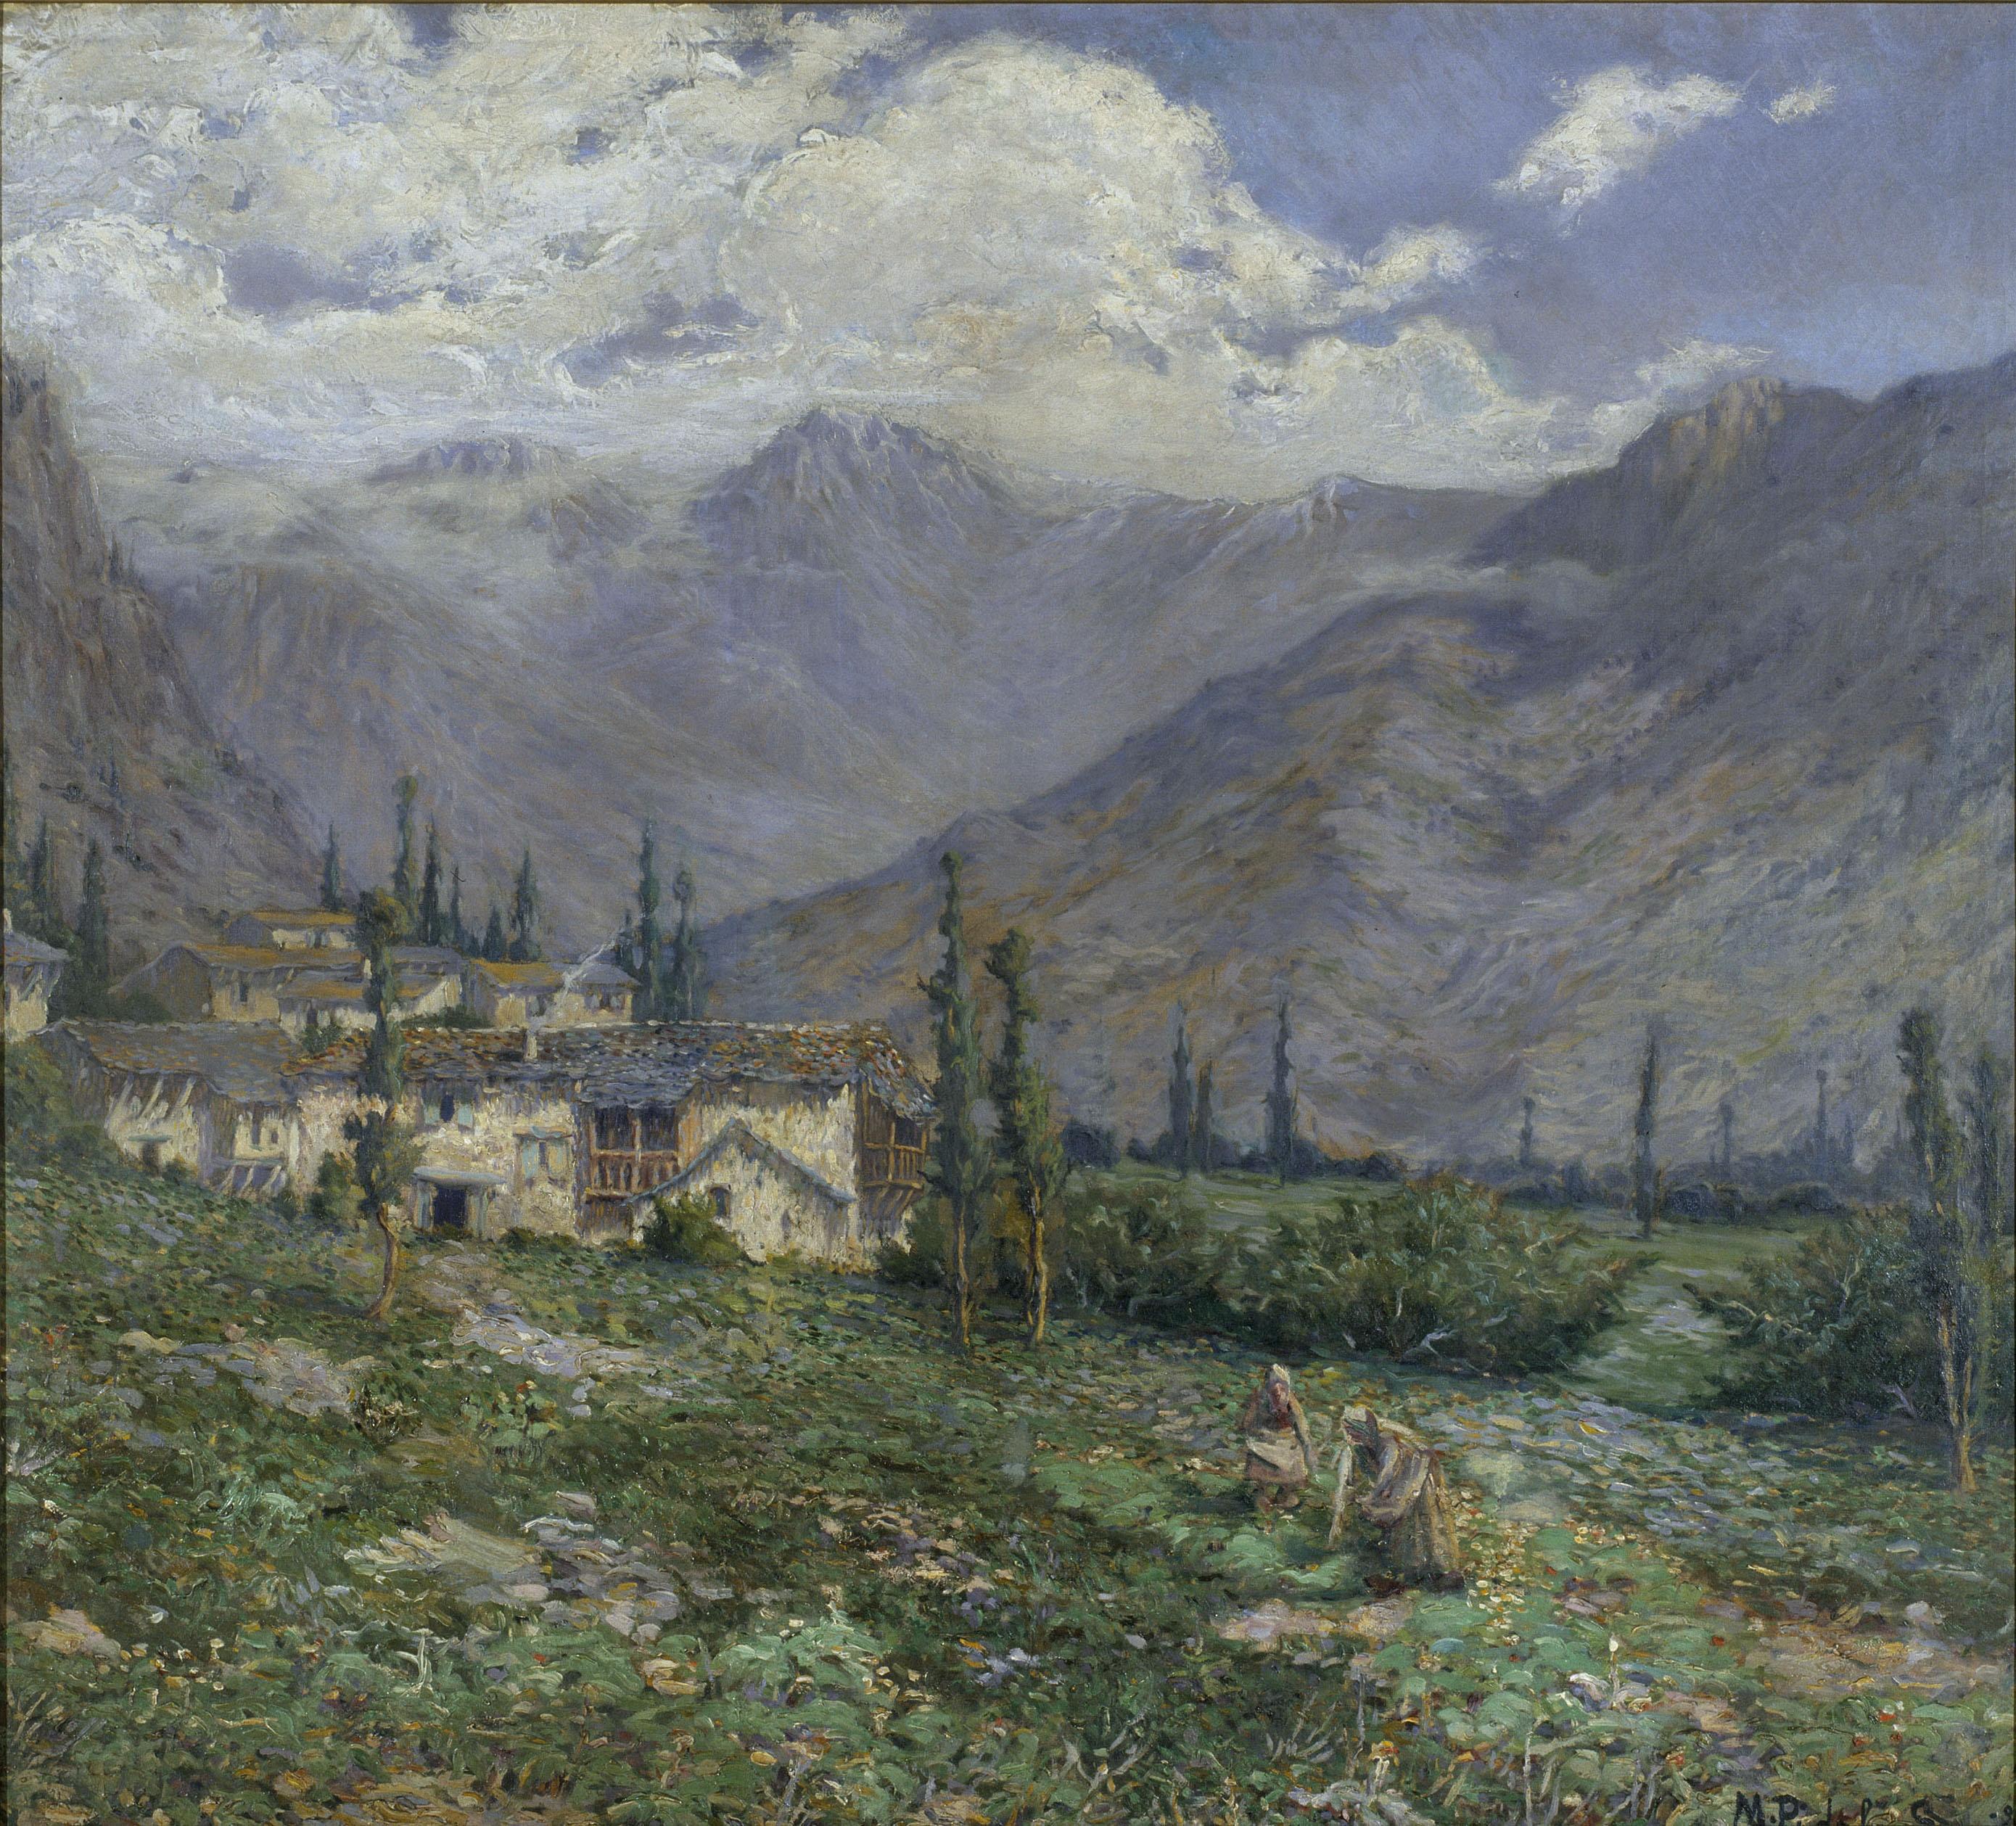 Marià Pidelaserra - Pyrenees Landscape - 1899